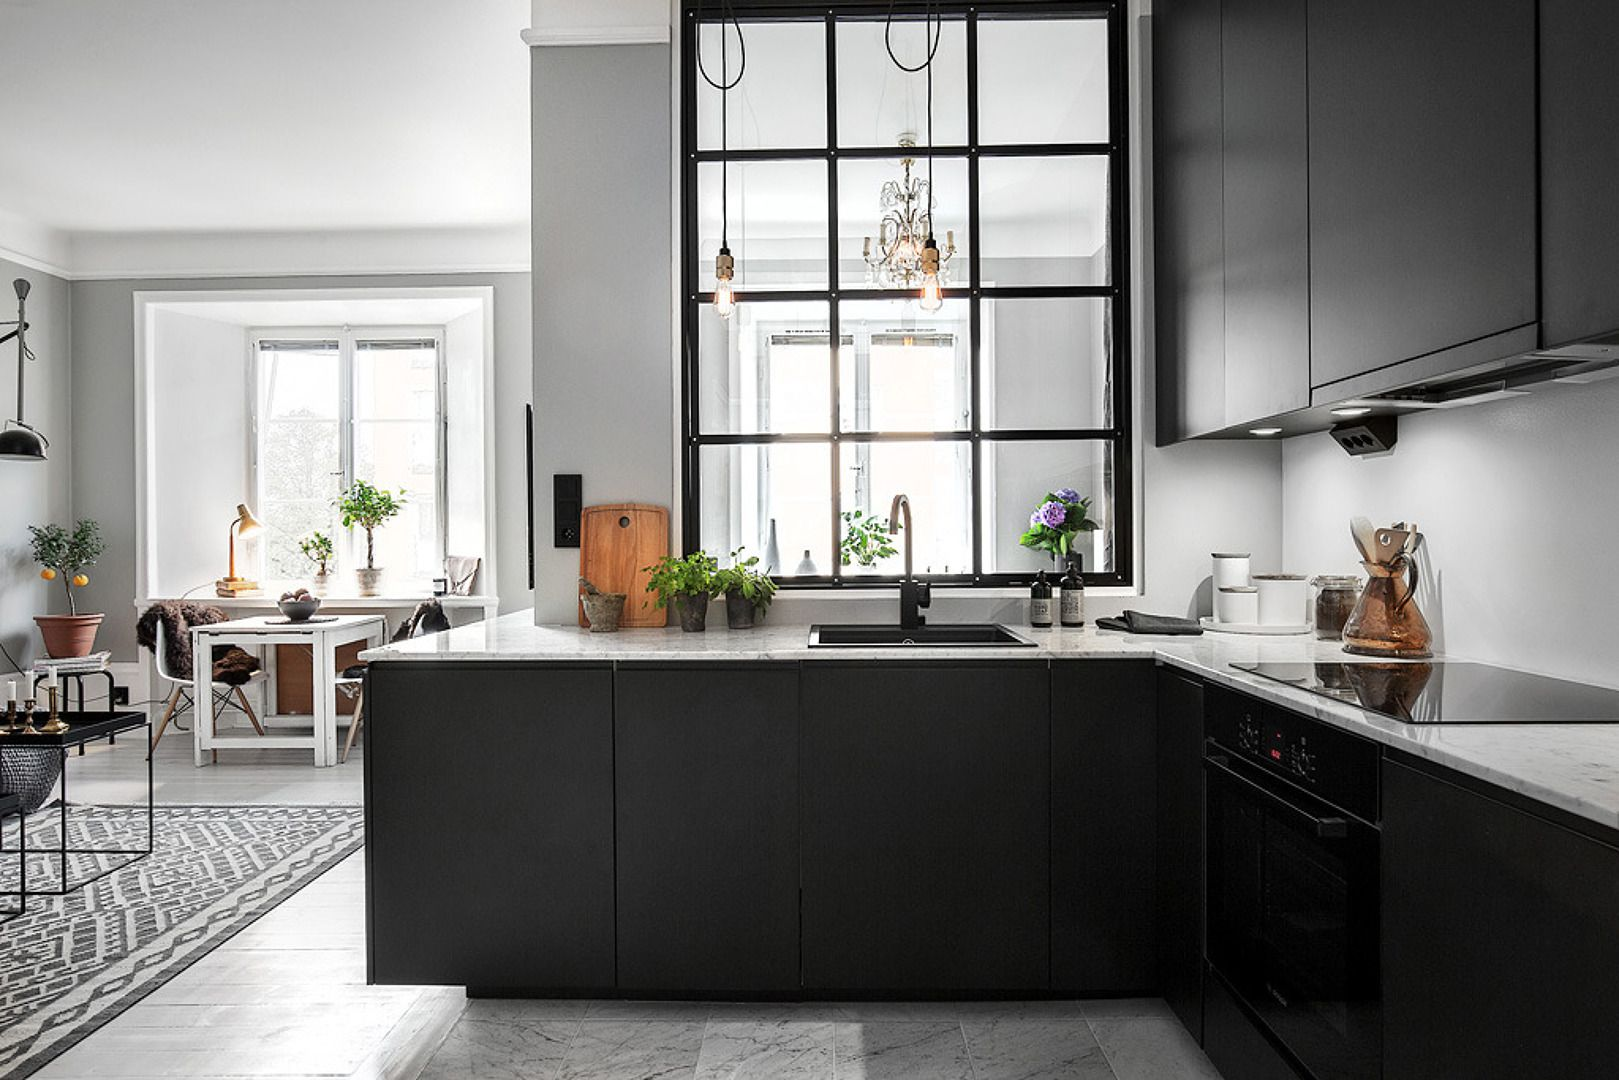 Finestra Interna Per Avere Luce In Cucina Interni Della Cucina Sala Da Pranzo E Cucina Idee Per La Cucina